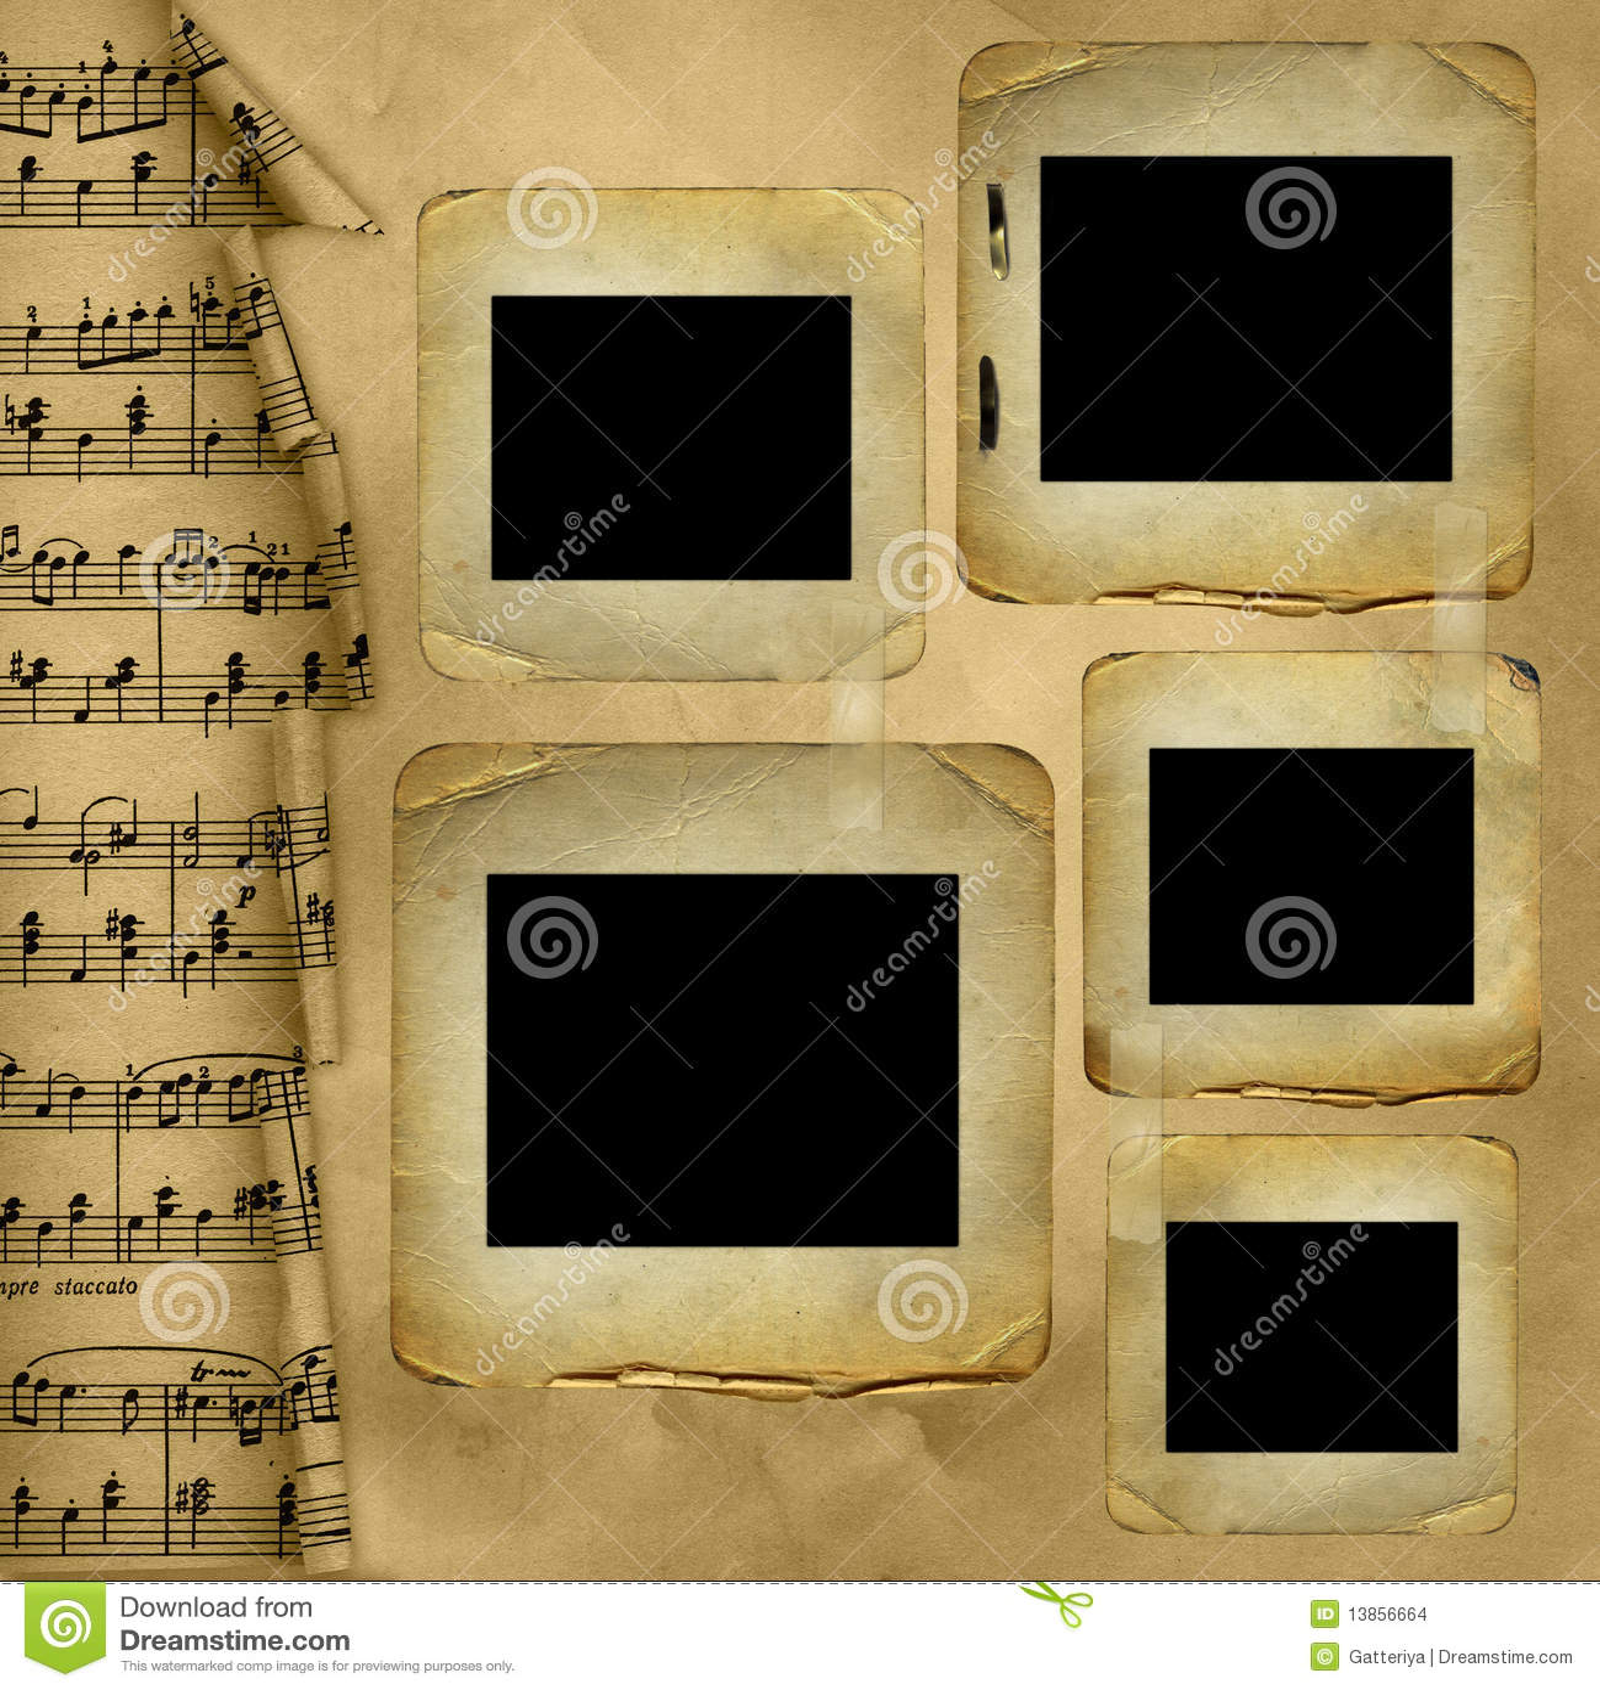 old slides for photo on musical background stock illustration